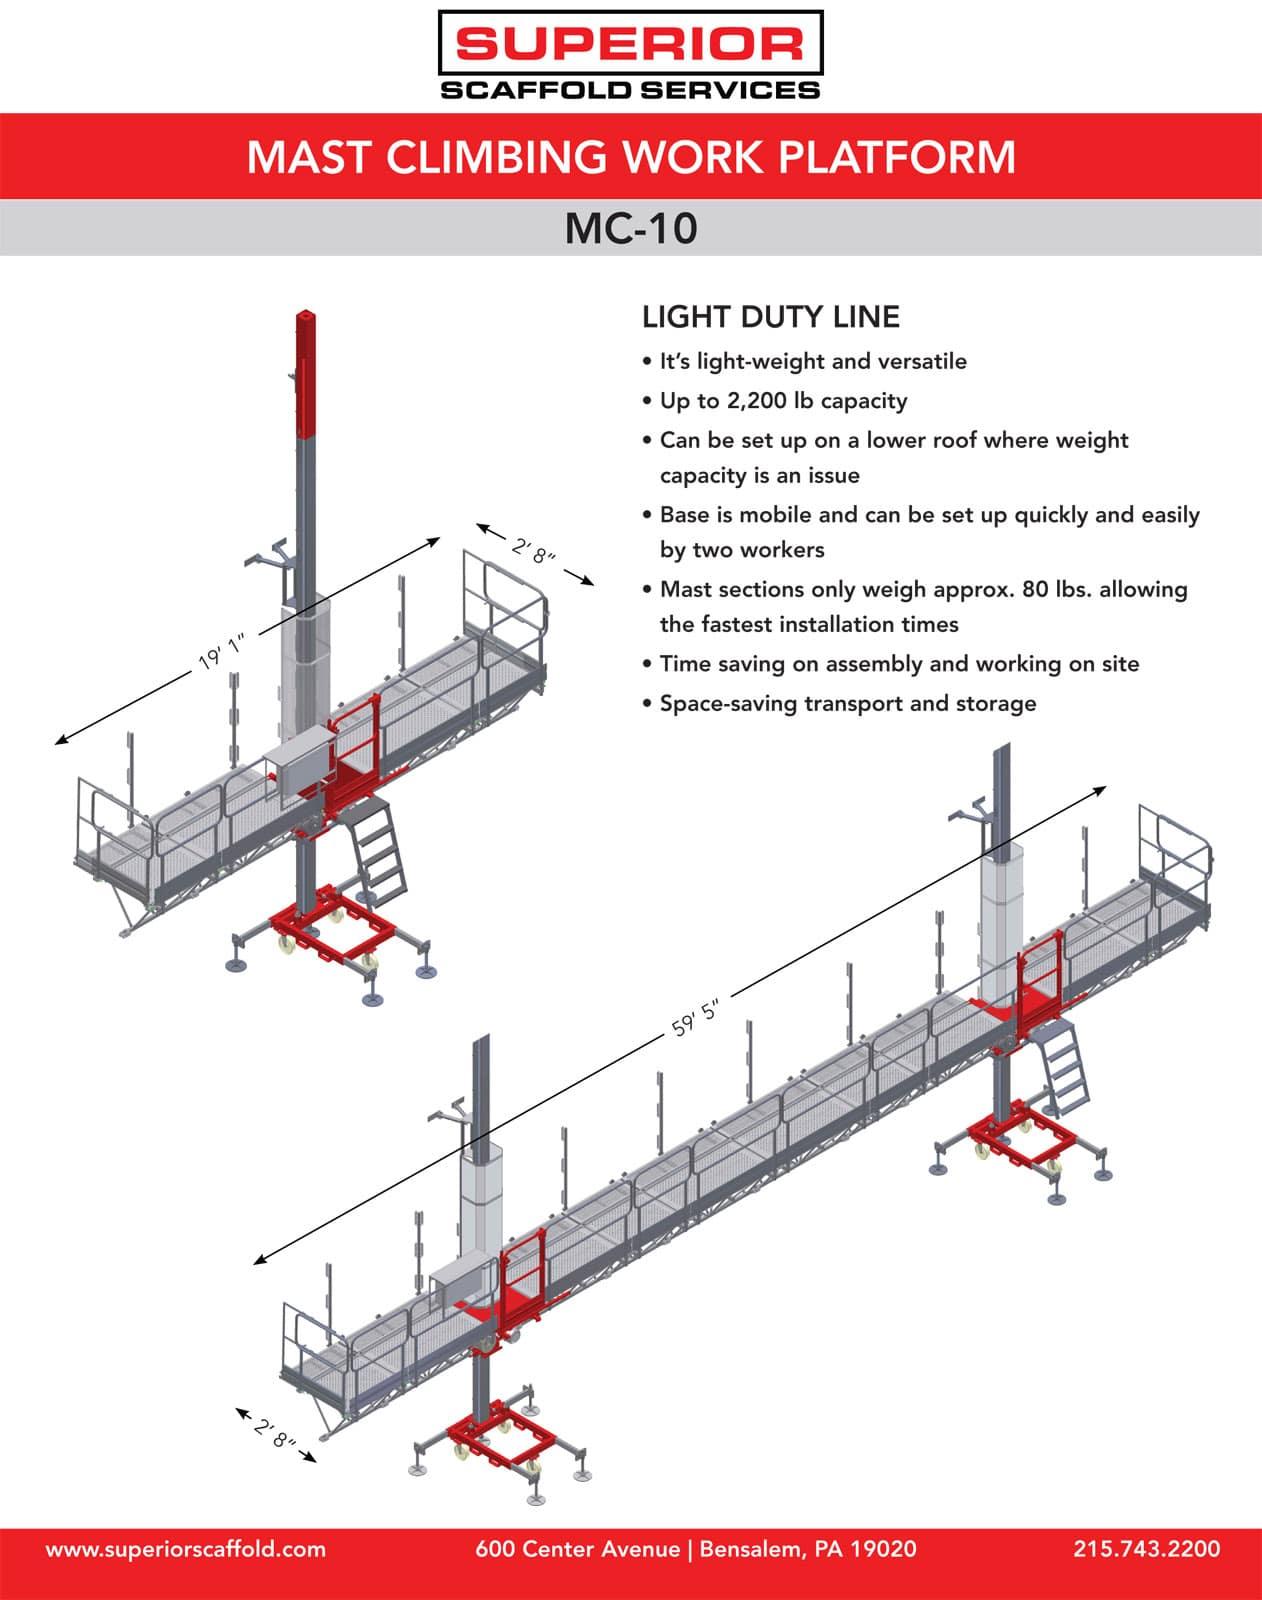 rent mast climber, mc-10